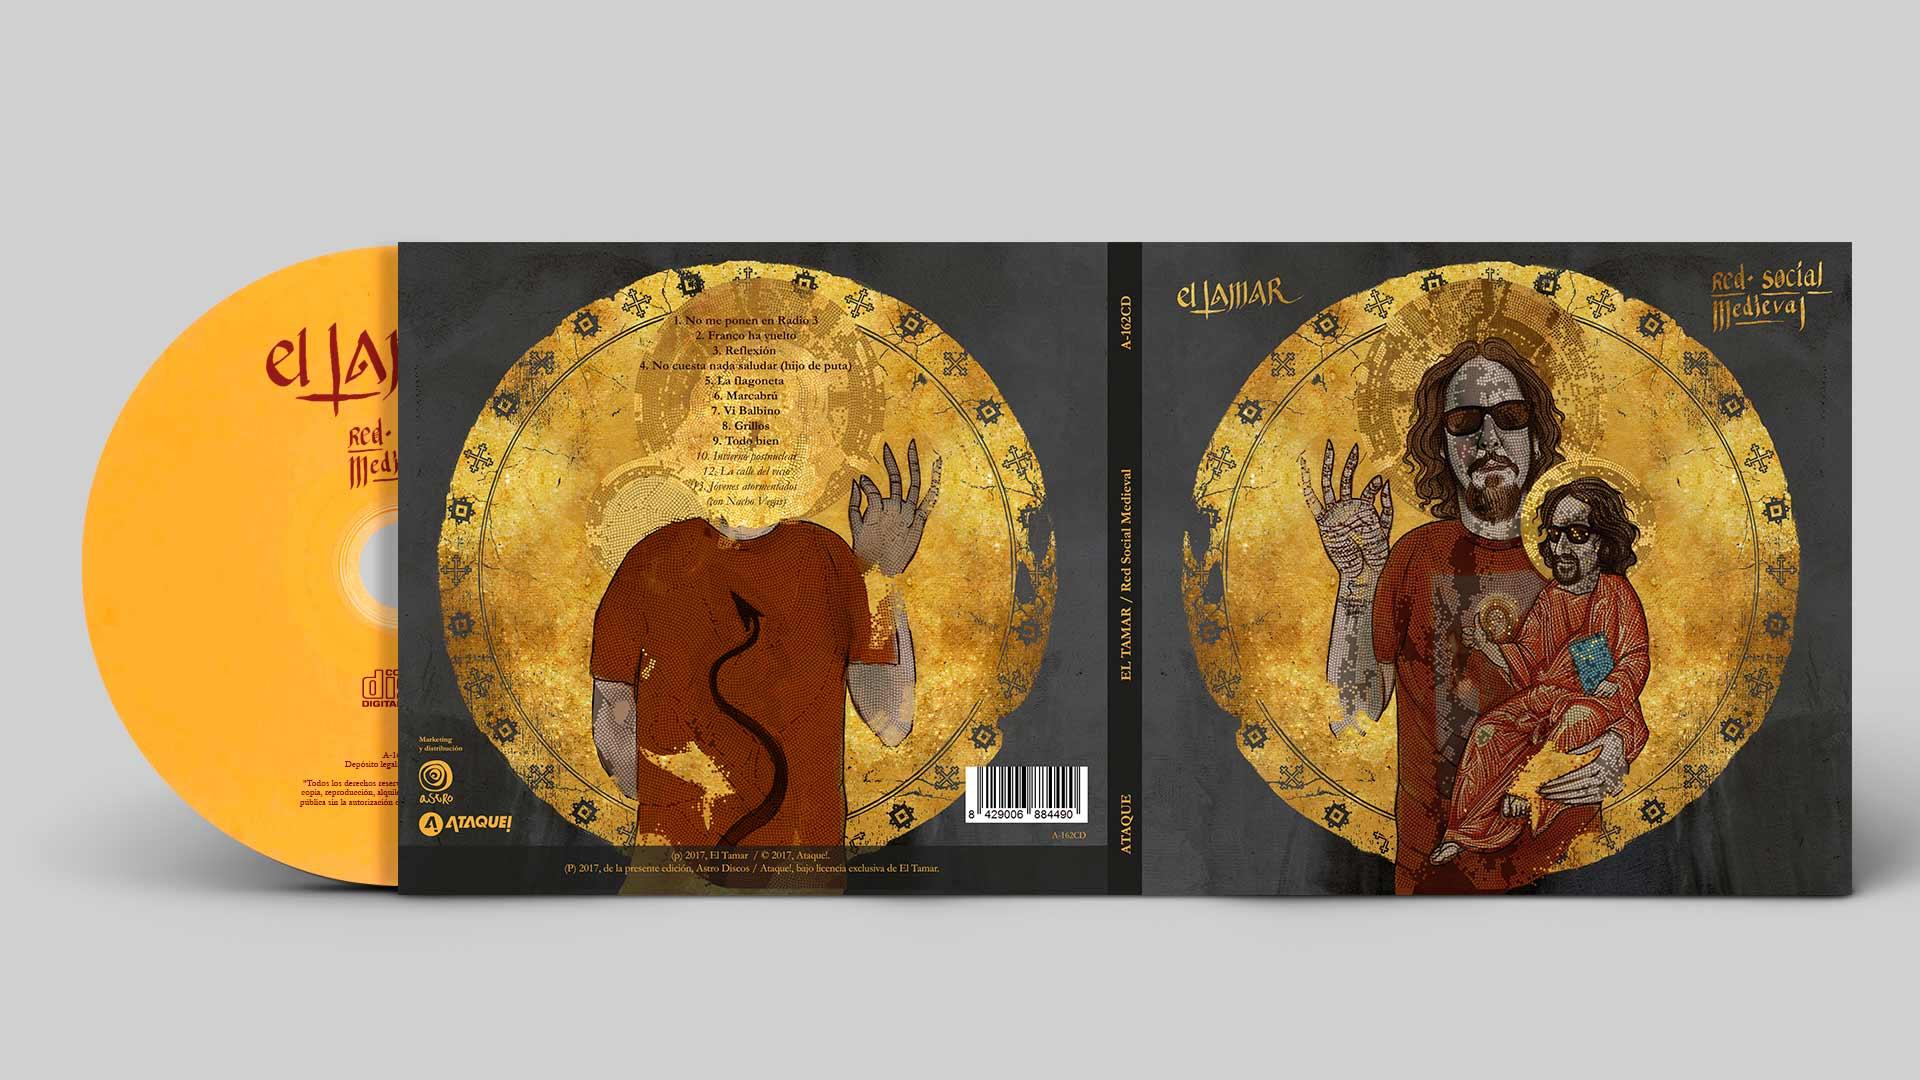 El Támar / CD artwork